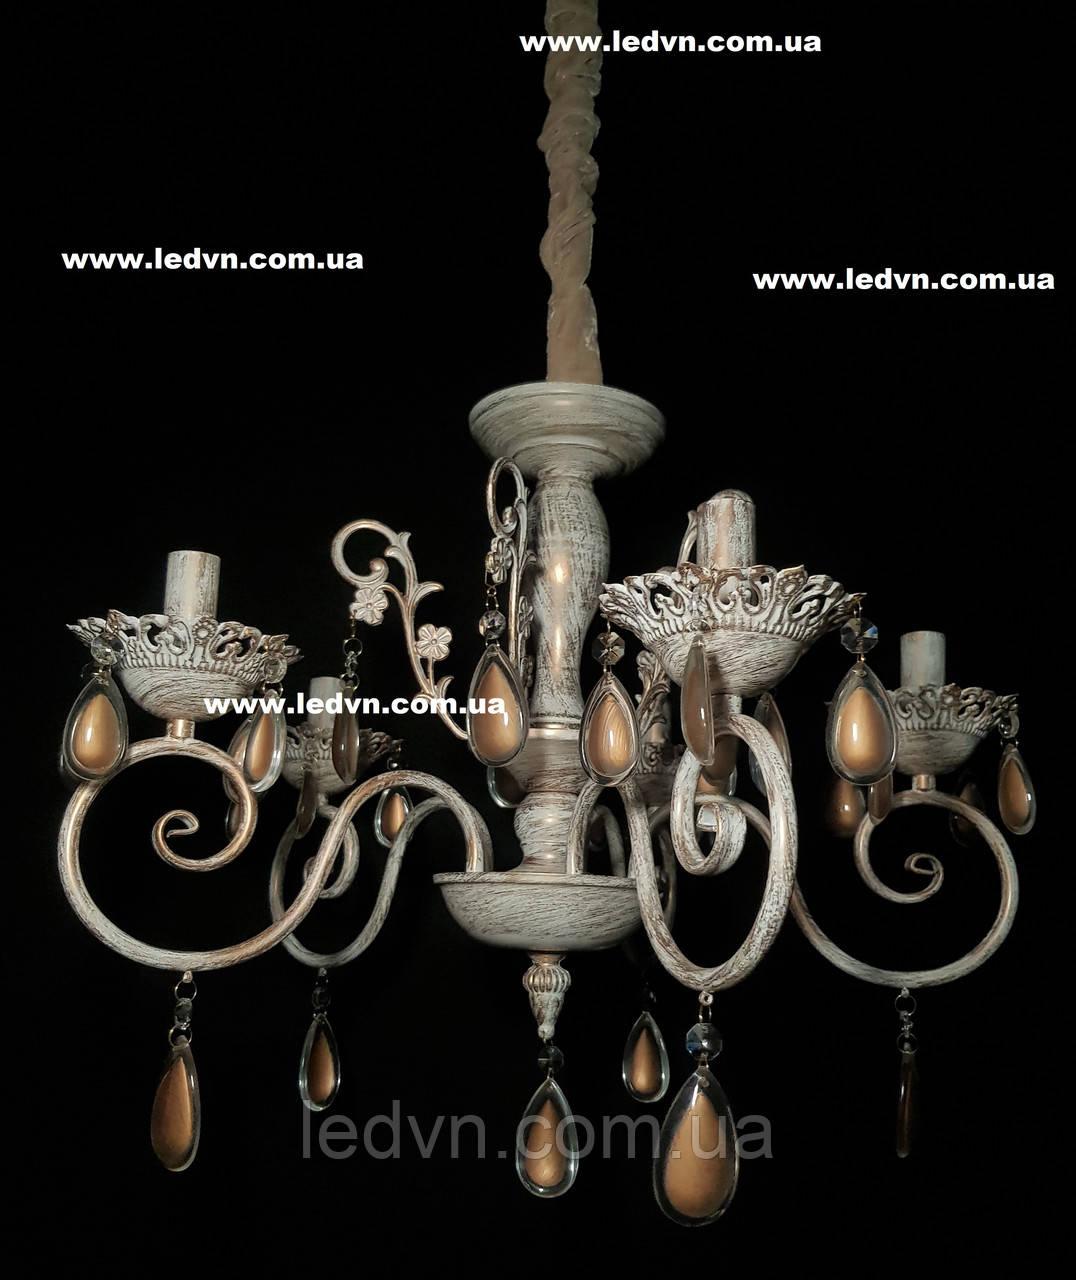 Класична підвісна люстра в бежевих тонах на 5 ламп